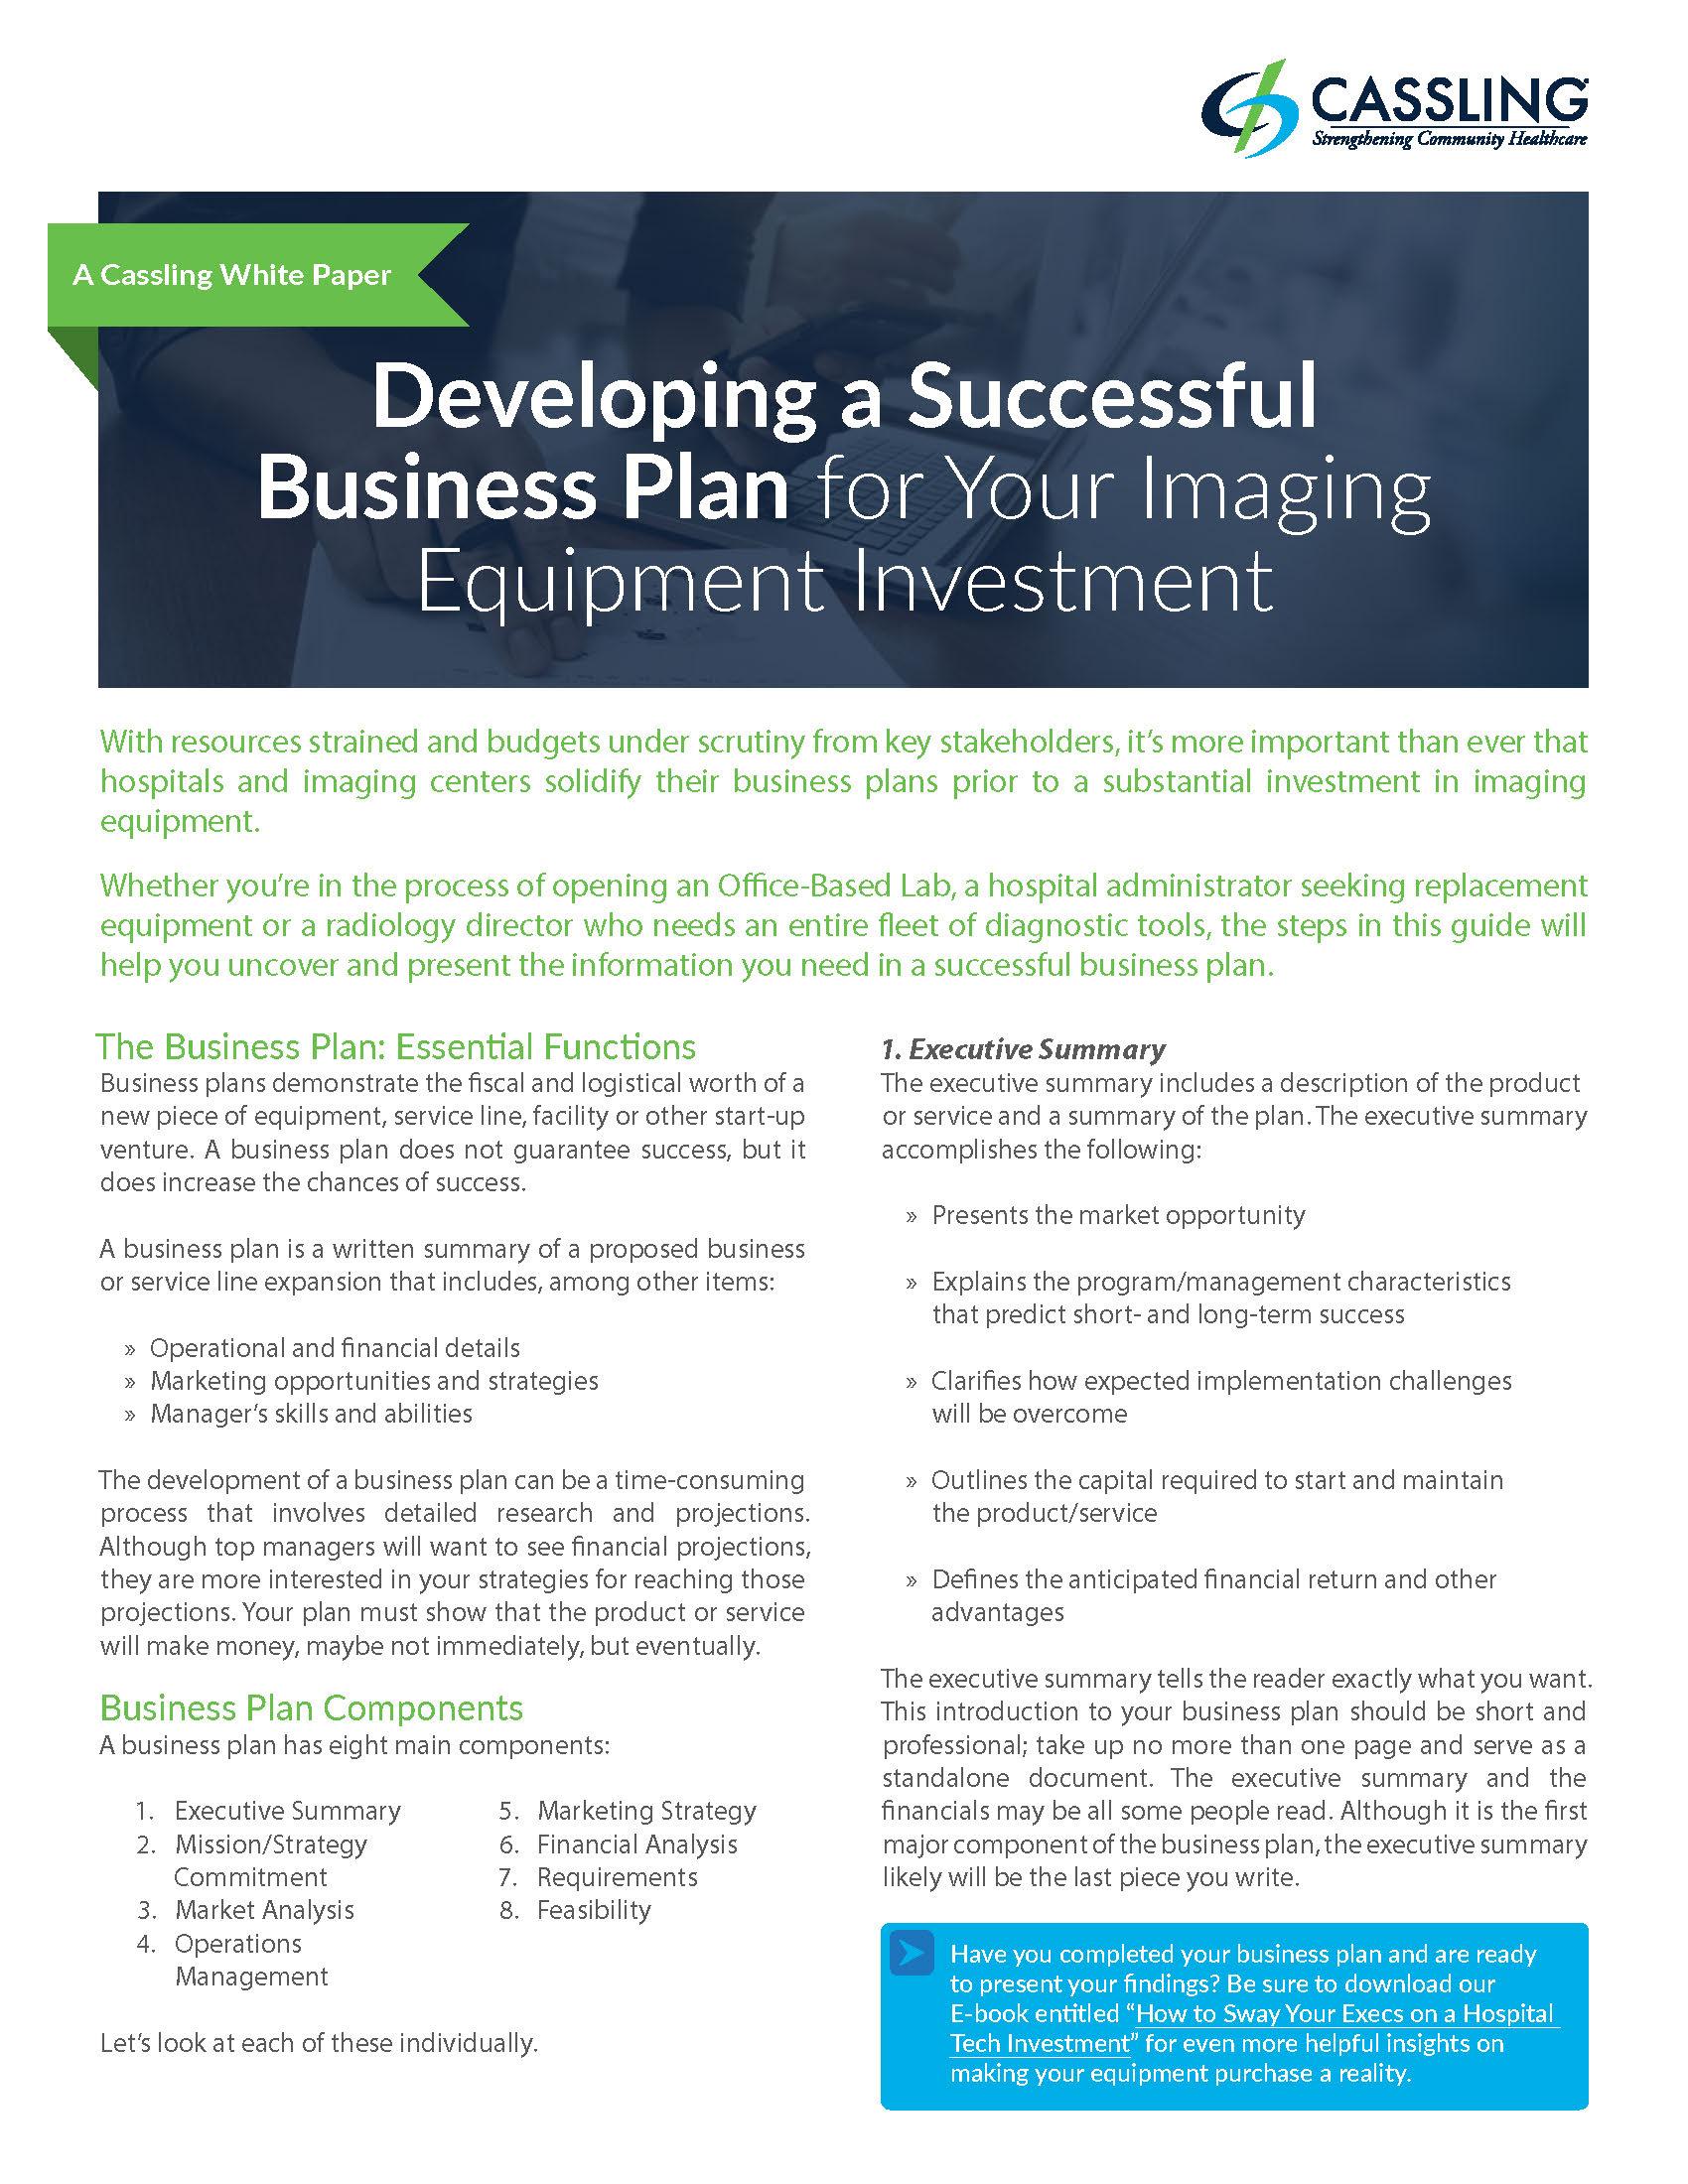 BusinessPlanforImagingEquipment-Cover.jpg